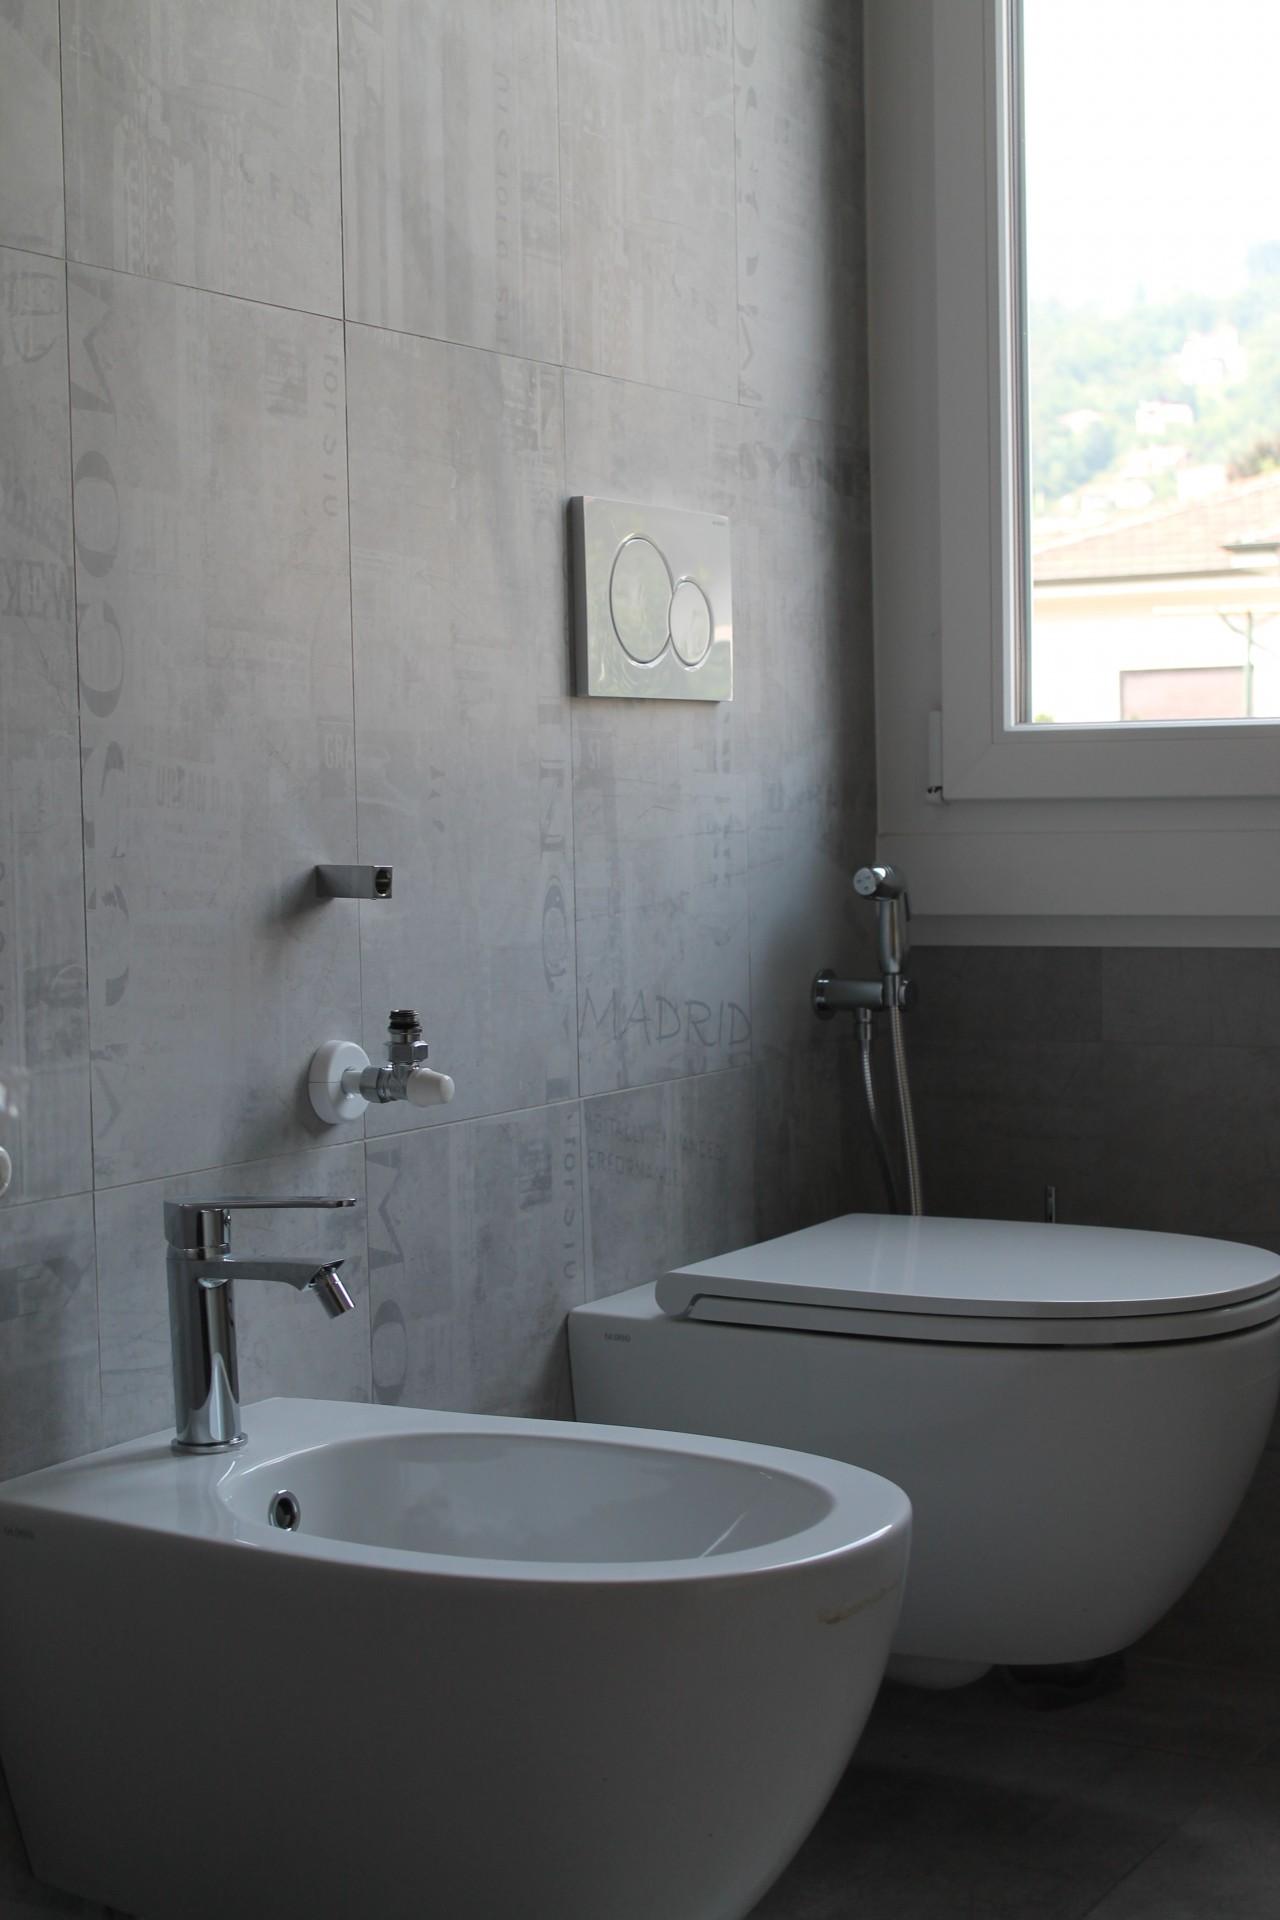 Bagni in gres porcellanato sinergy zero9 - Rivestimento bagno gres porcellanato ...